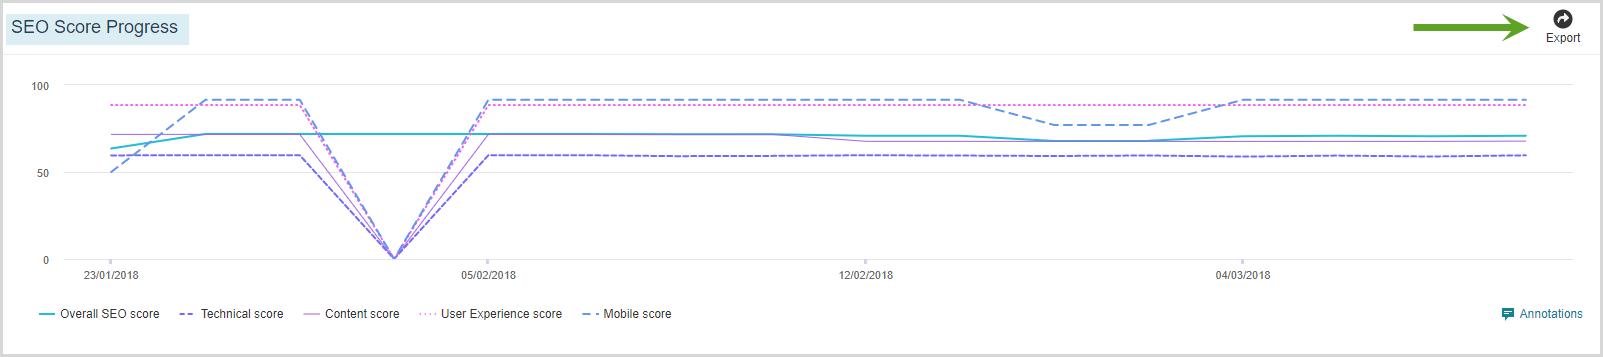 SEO_Score_progress